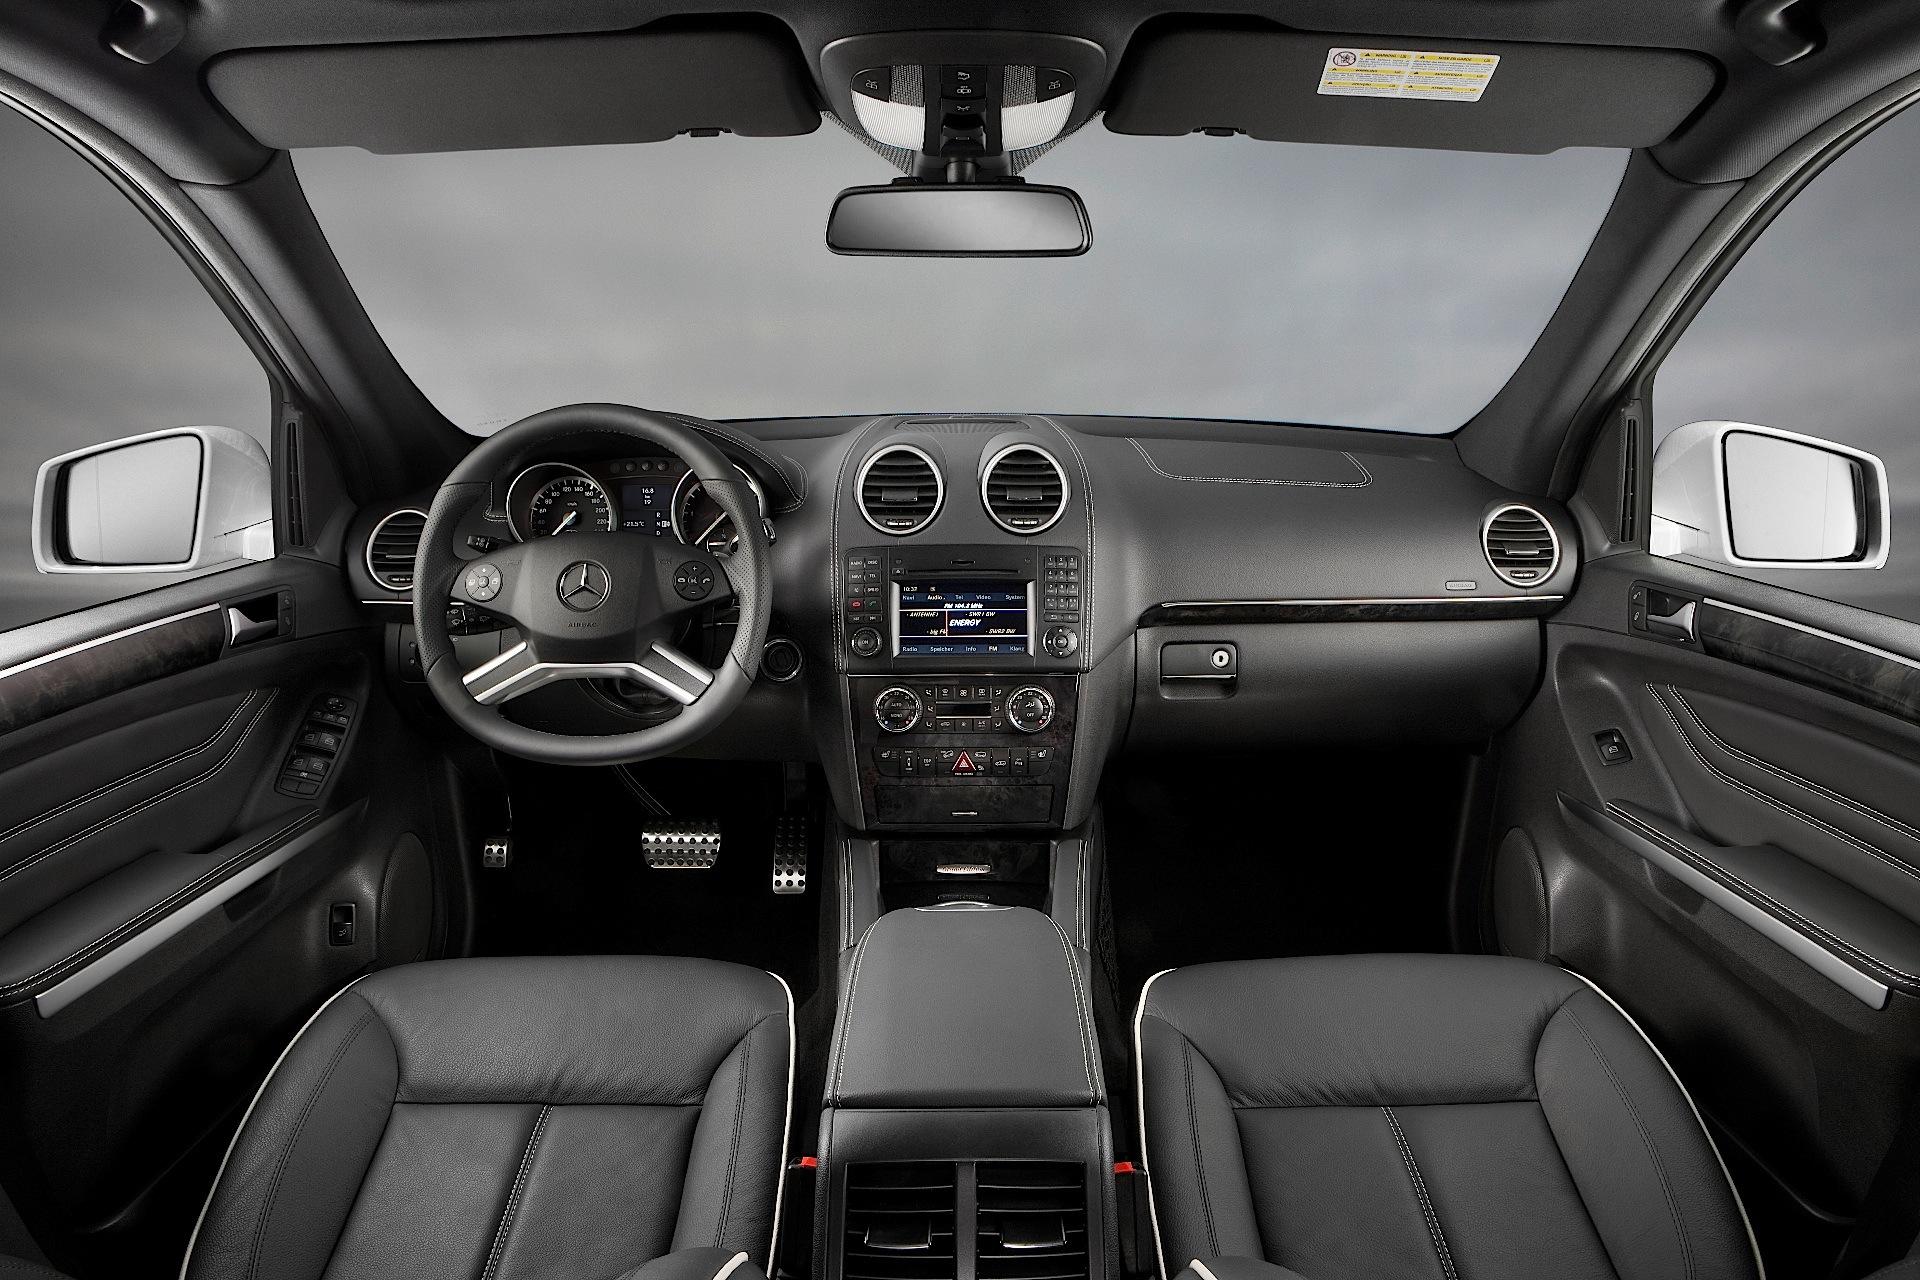 mercedes m klasse w164 airbag armaturenbrett mit airbag. Black Bedroom Furniture Sets. Home Design Ideas